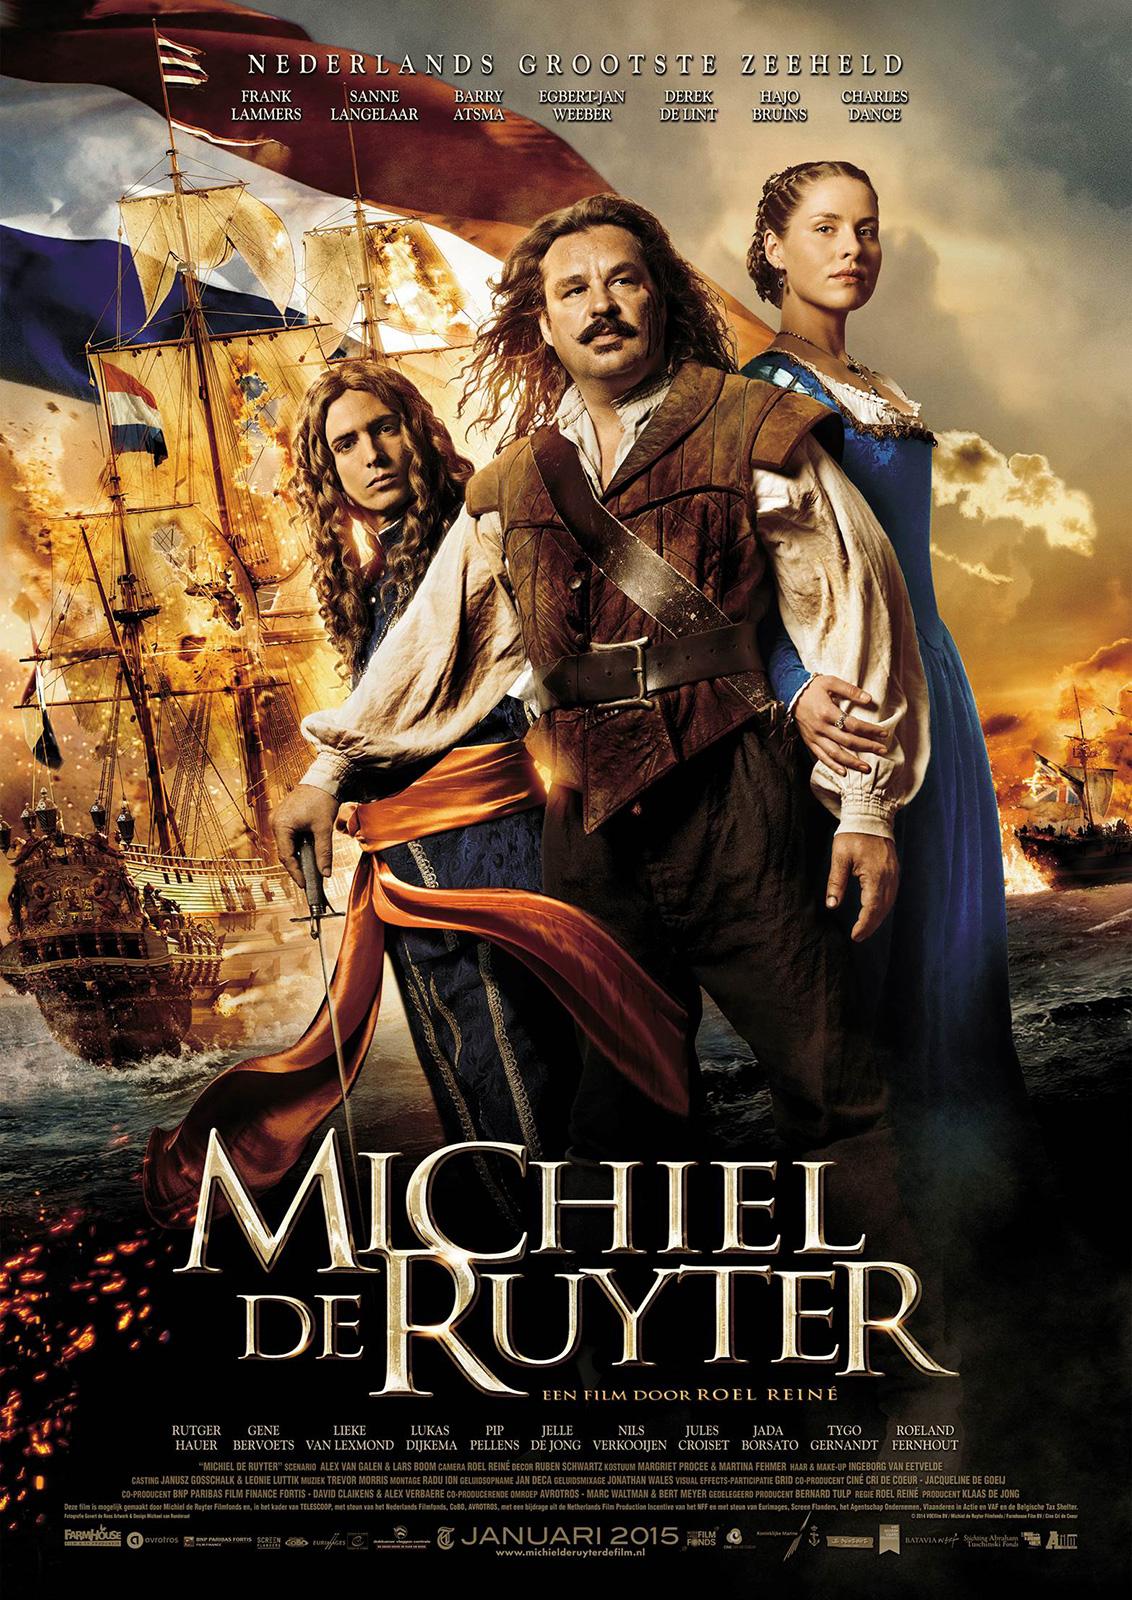 Michiel de Ruyter Teasers